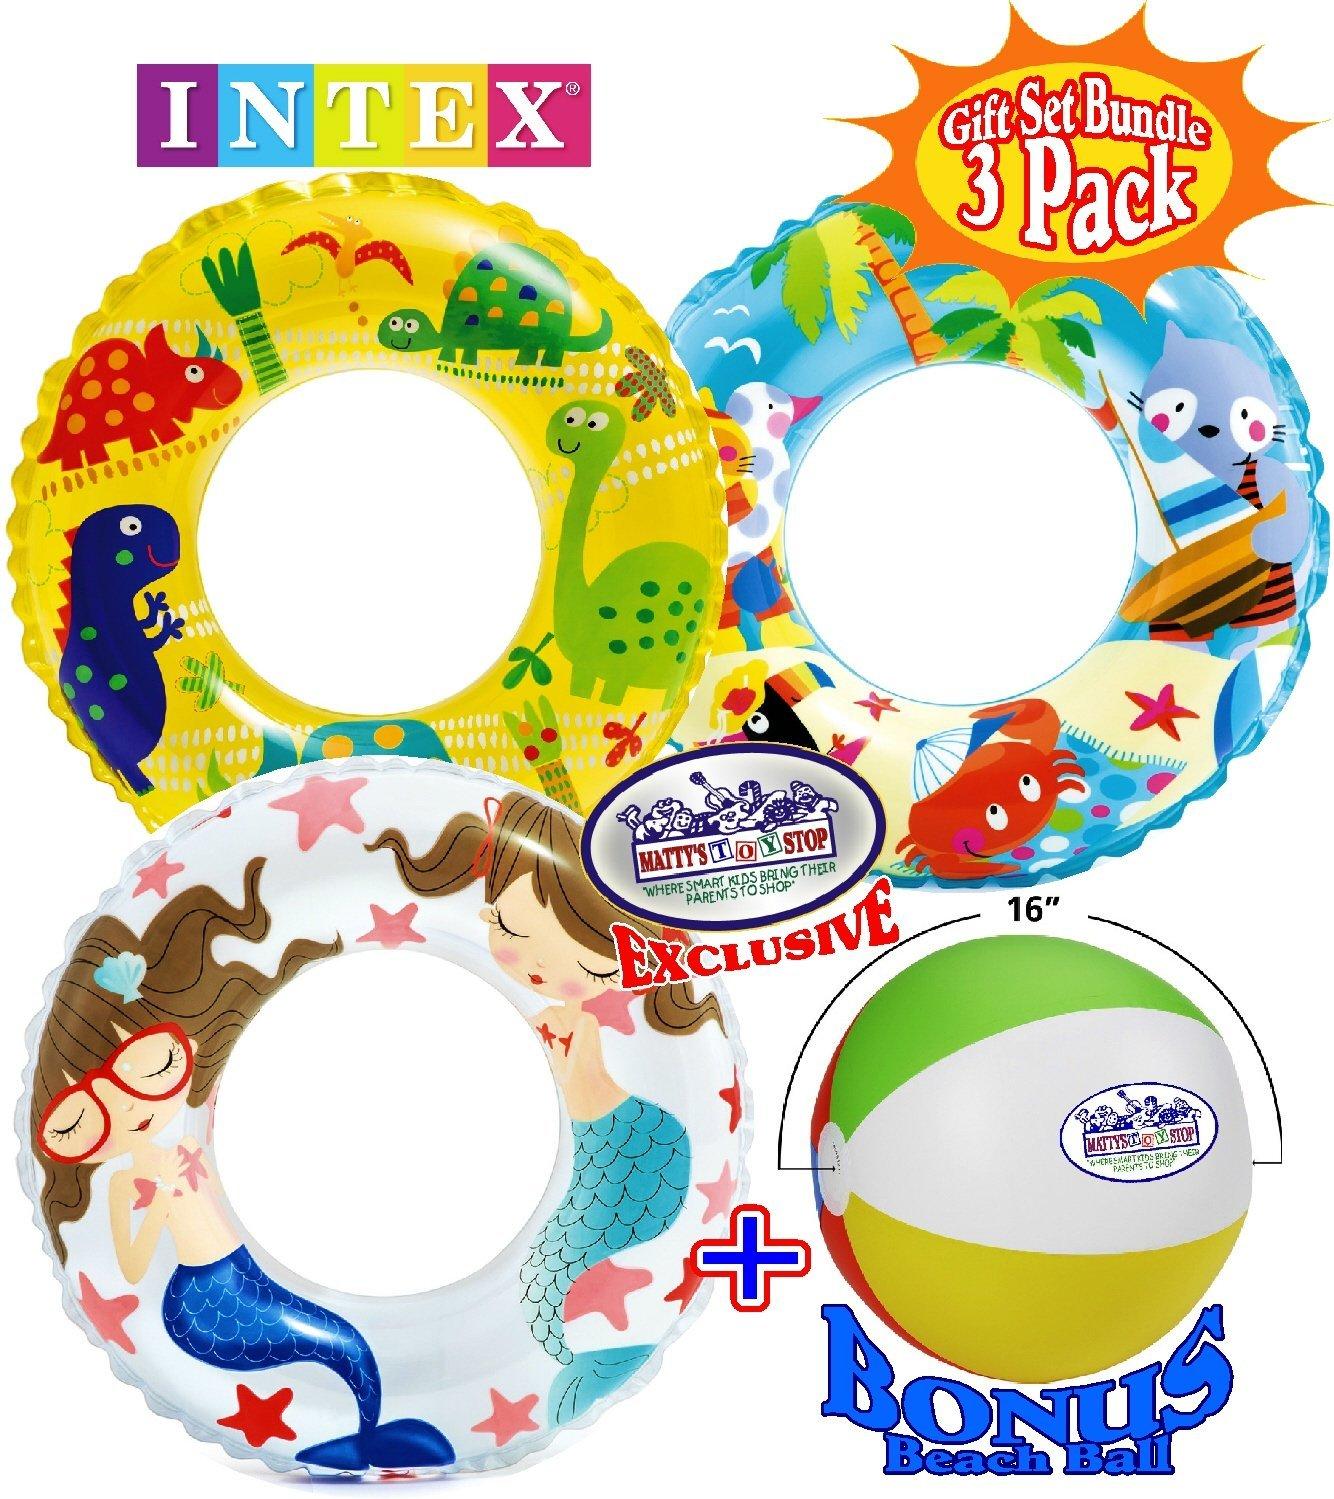 "Ocean Reef Transparent Swim Rings (24"") ""Dinosaurs"", ""Mermaid"" & ""Tropical Beach"" Gift Set Bundle with Bonus ""Matty's Toy Stop"" 16"" Beach Ball - 3 Pack"